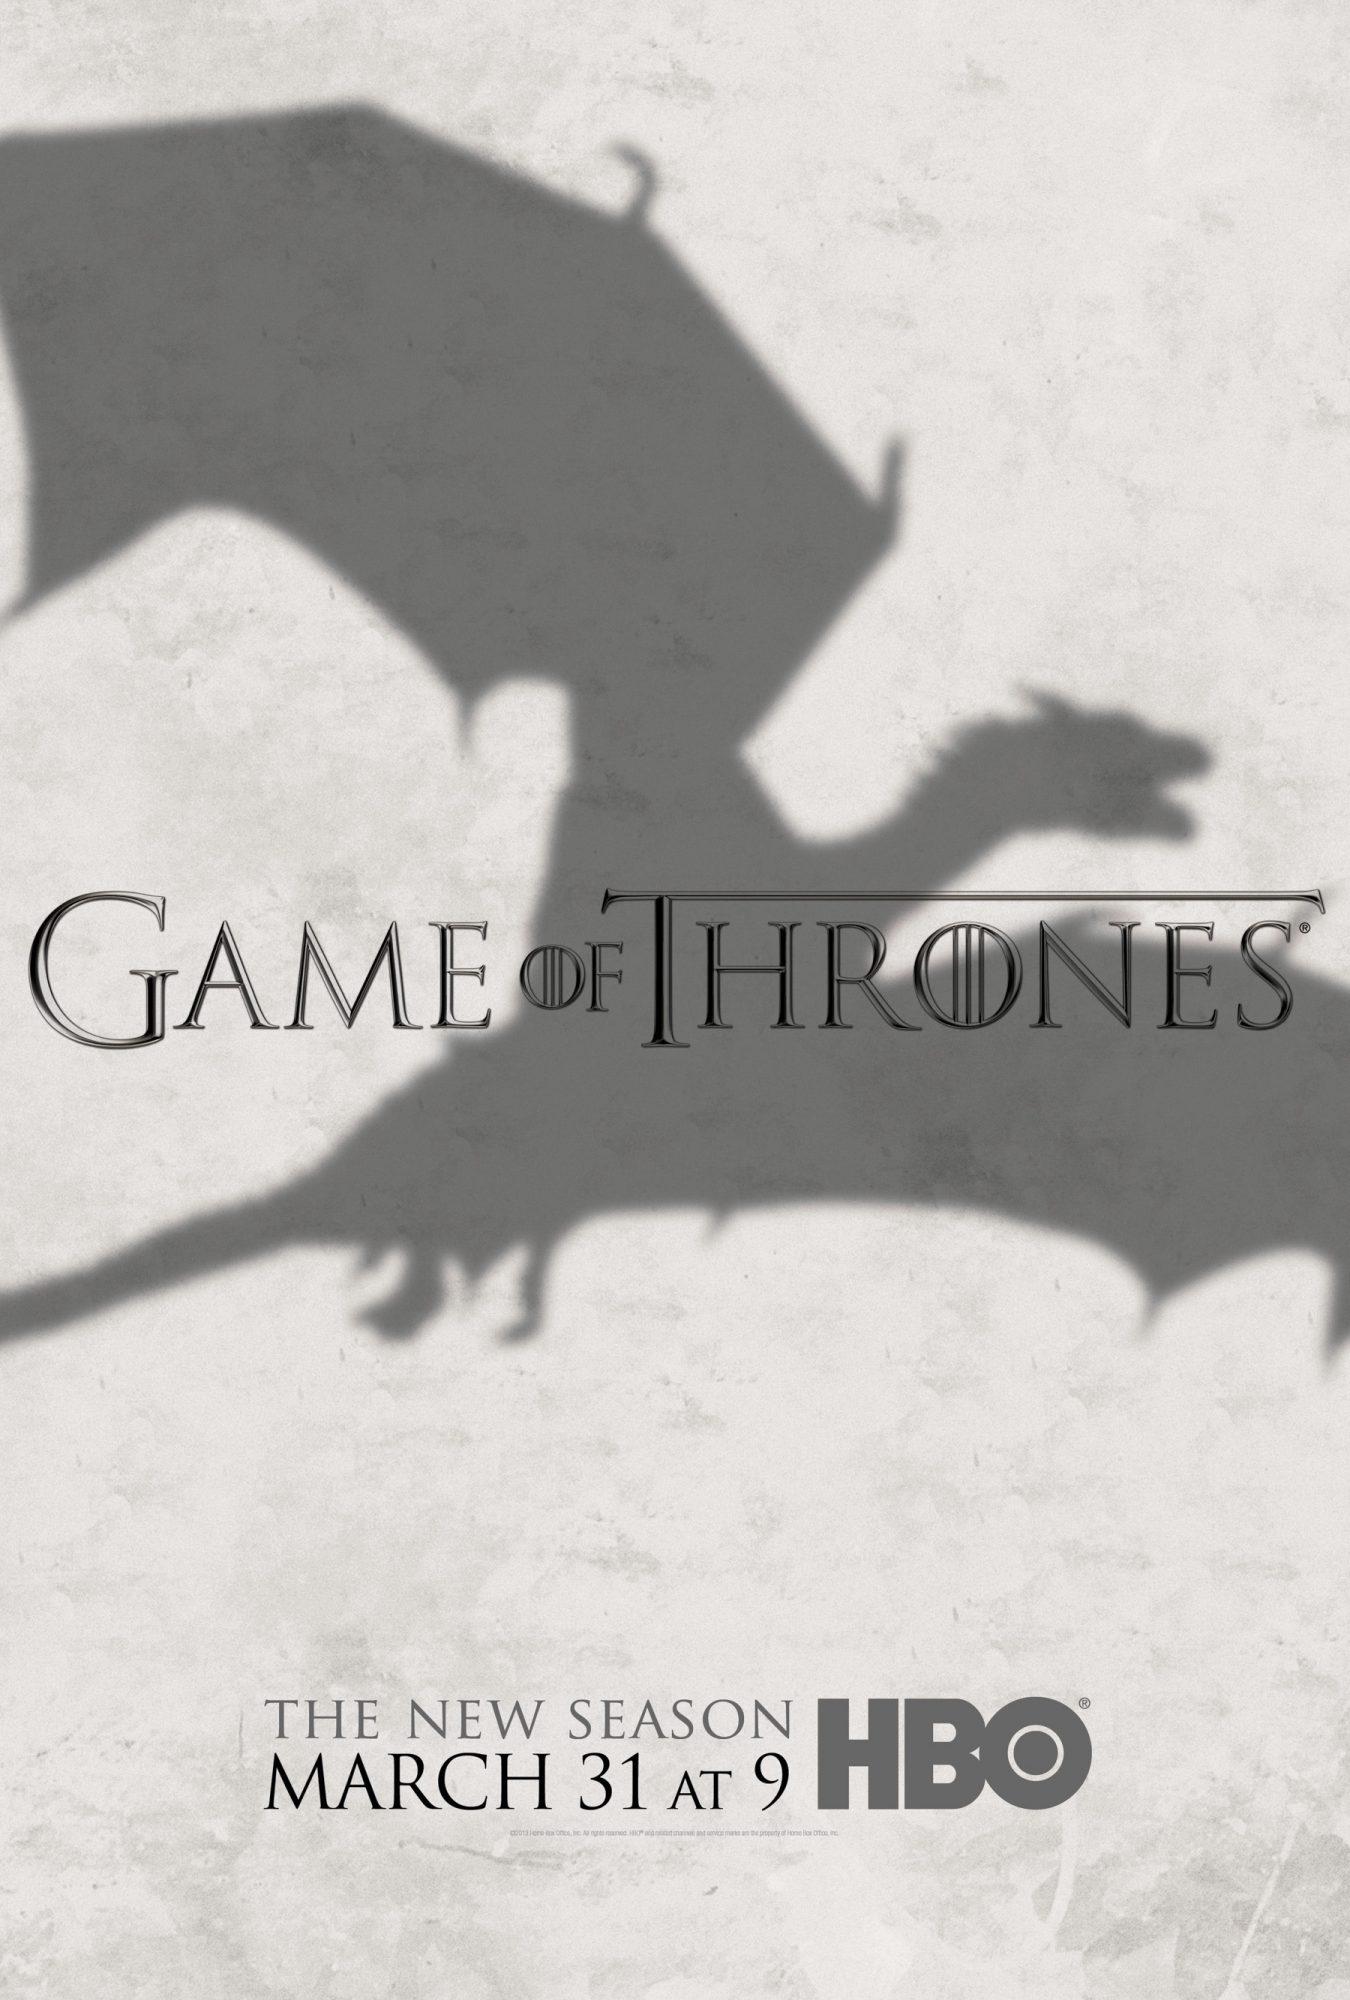 Game of Thrones poster/key artSeason 3CR: HBO